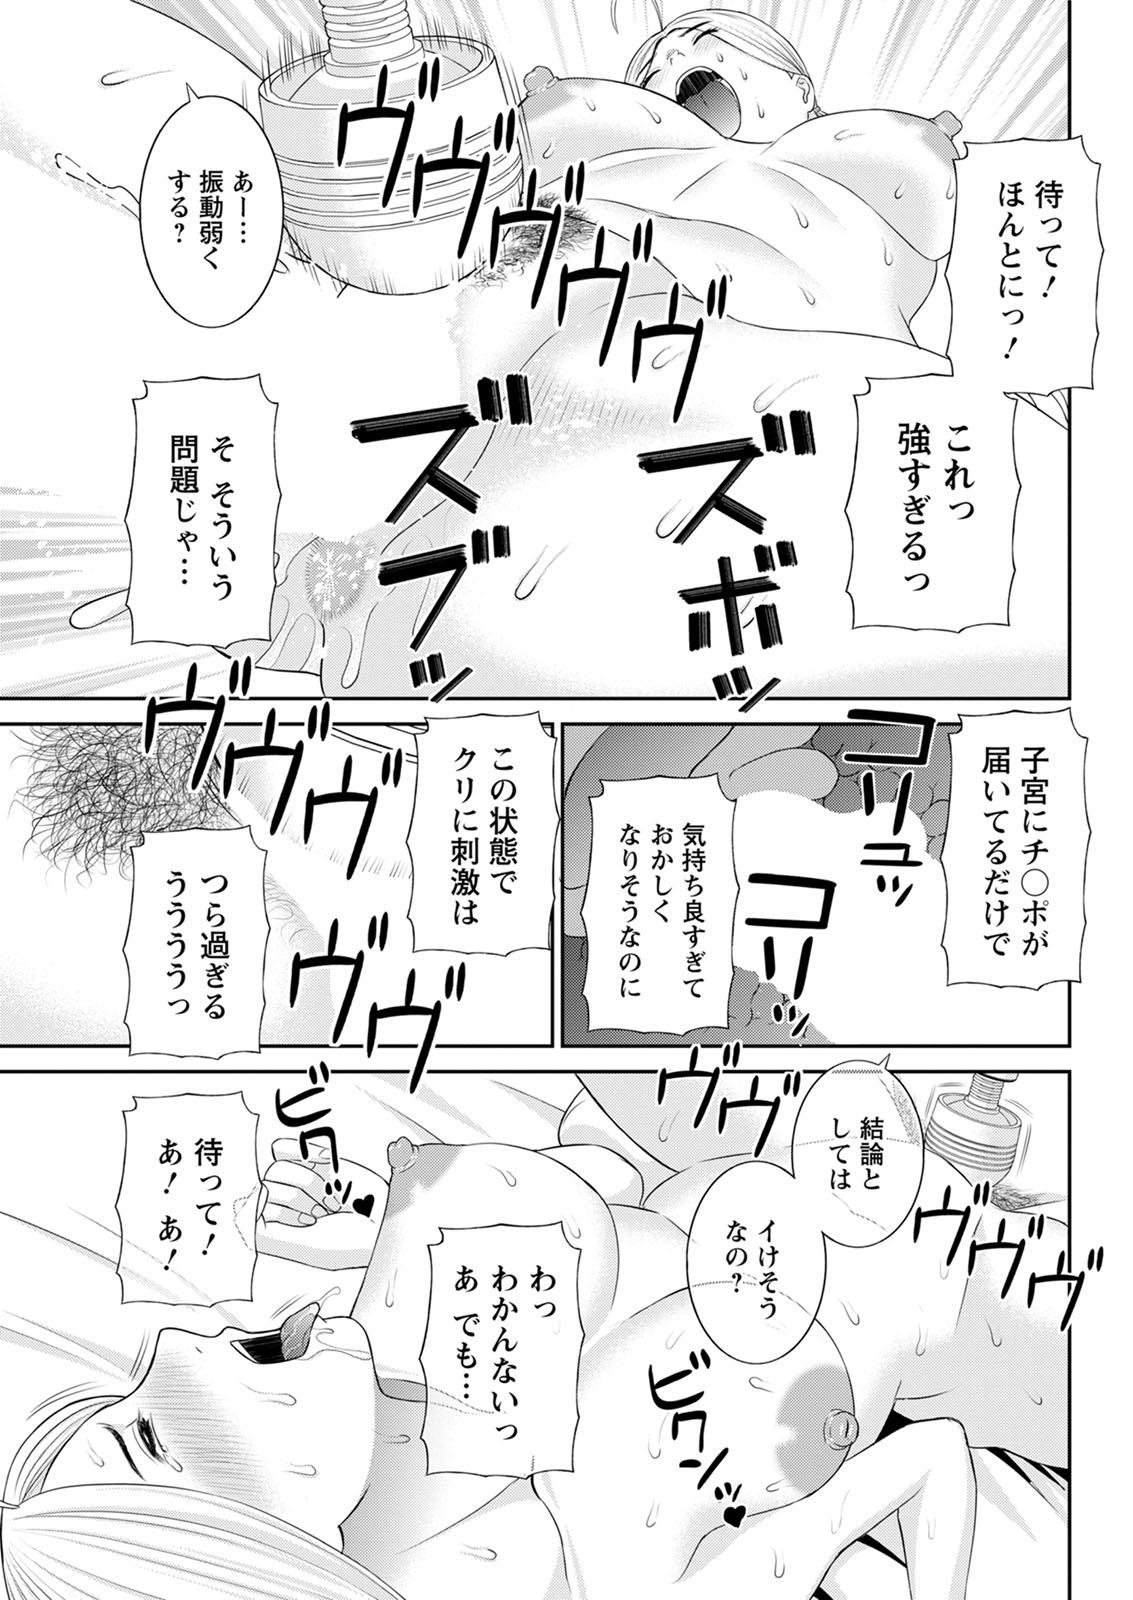 [Kawamori Misaki] Kaikan Hitotsuma Gakuen Ch. 1-6, 8-20 [Digital] 269